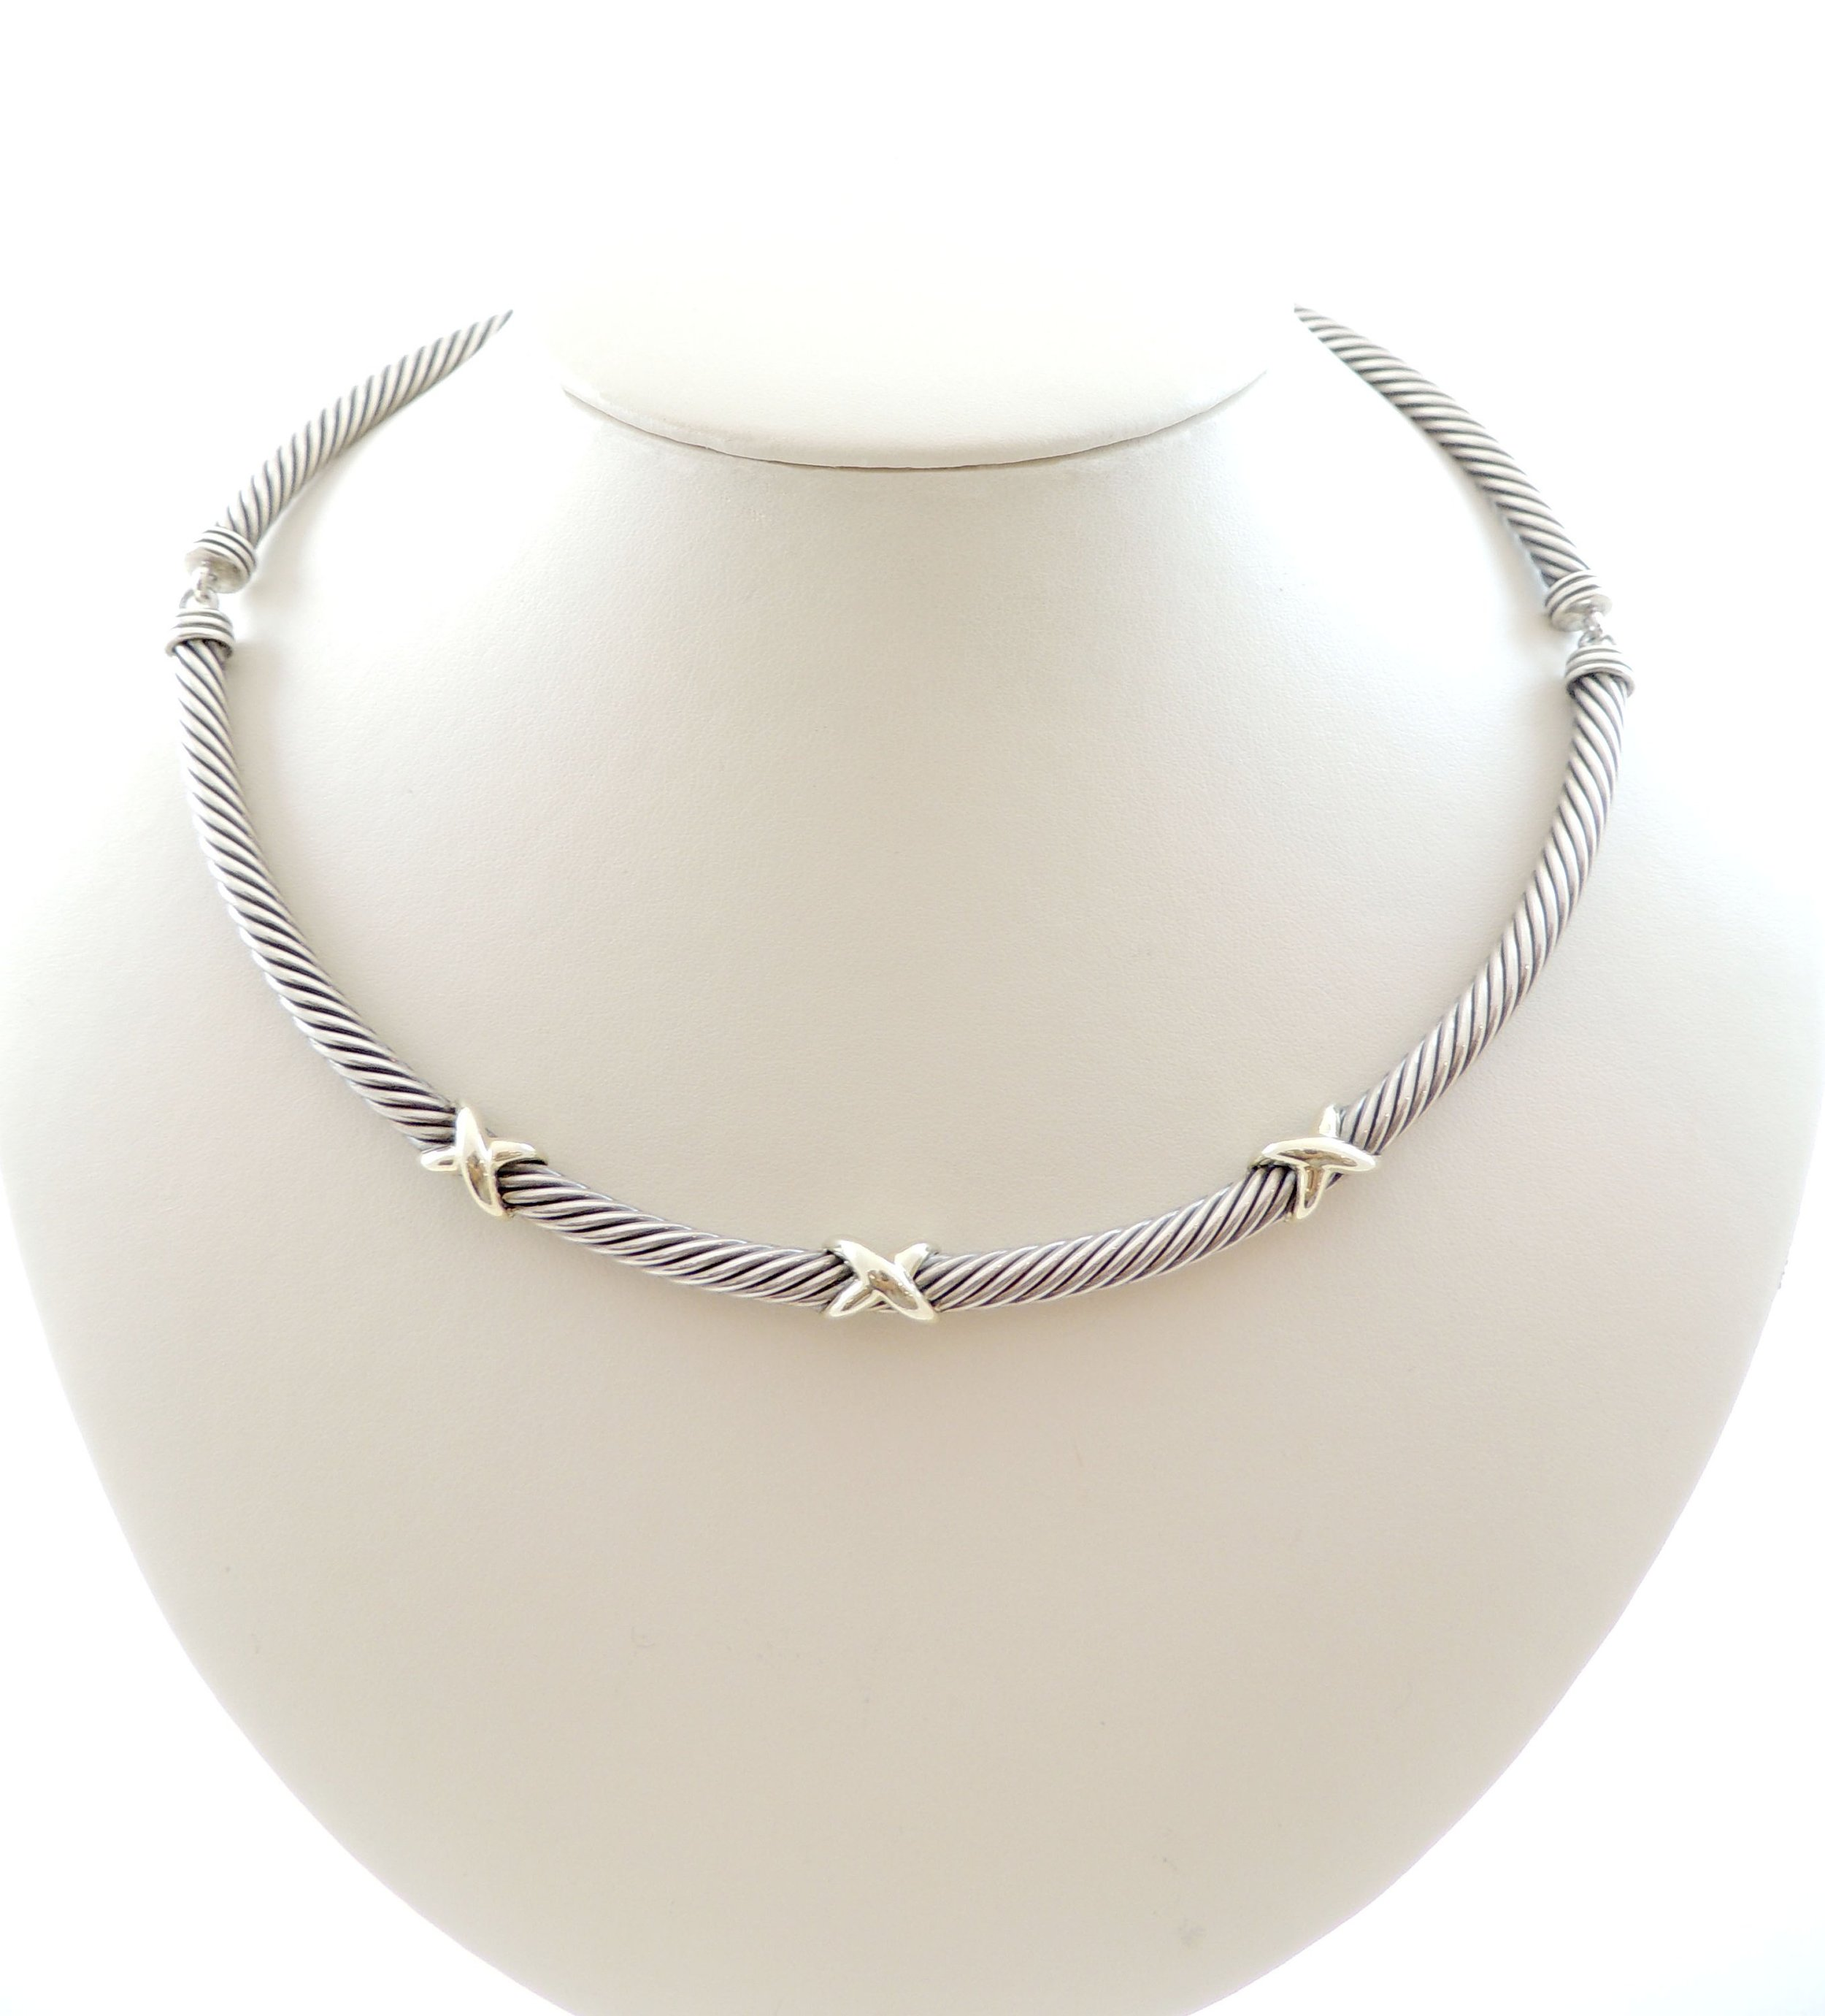 67e6d6f86bf3f David Yurman Sterling Silver 14k Gold Twisted Cable Collar — Neece Jewelers  | Palm City, FL